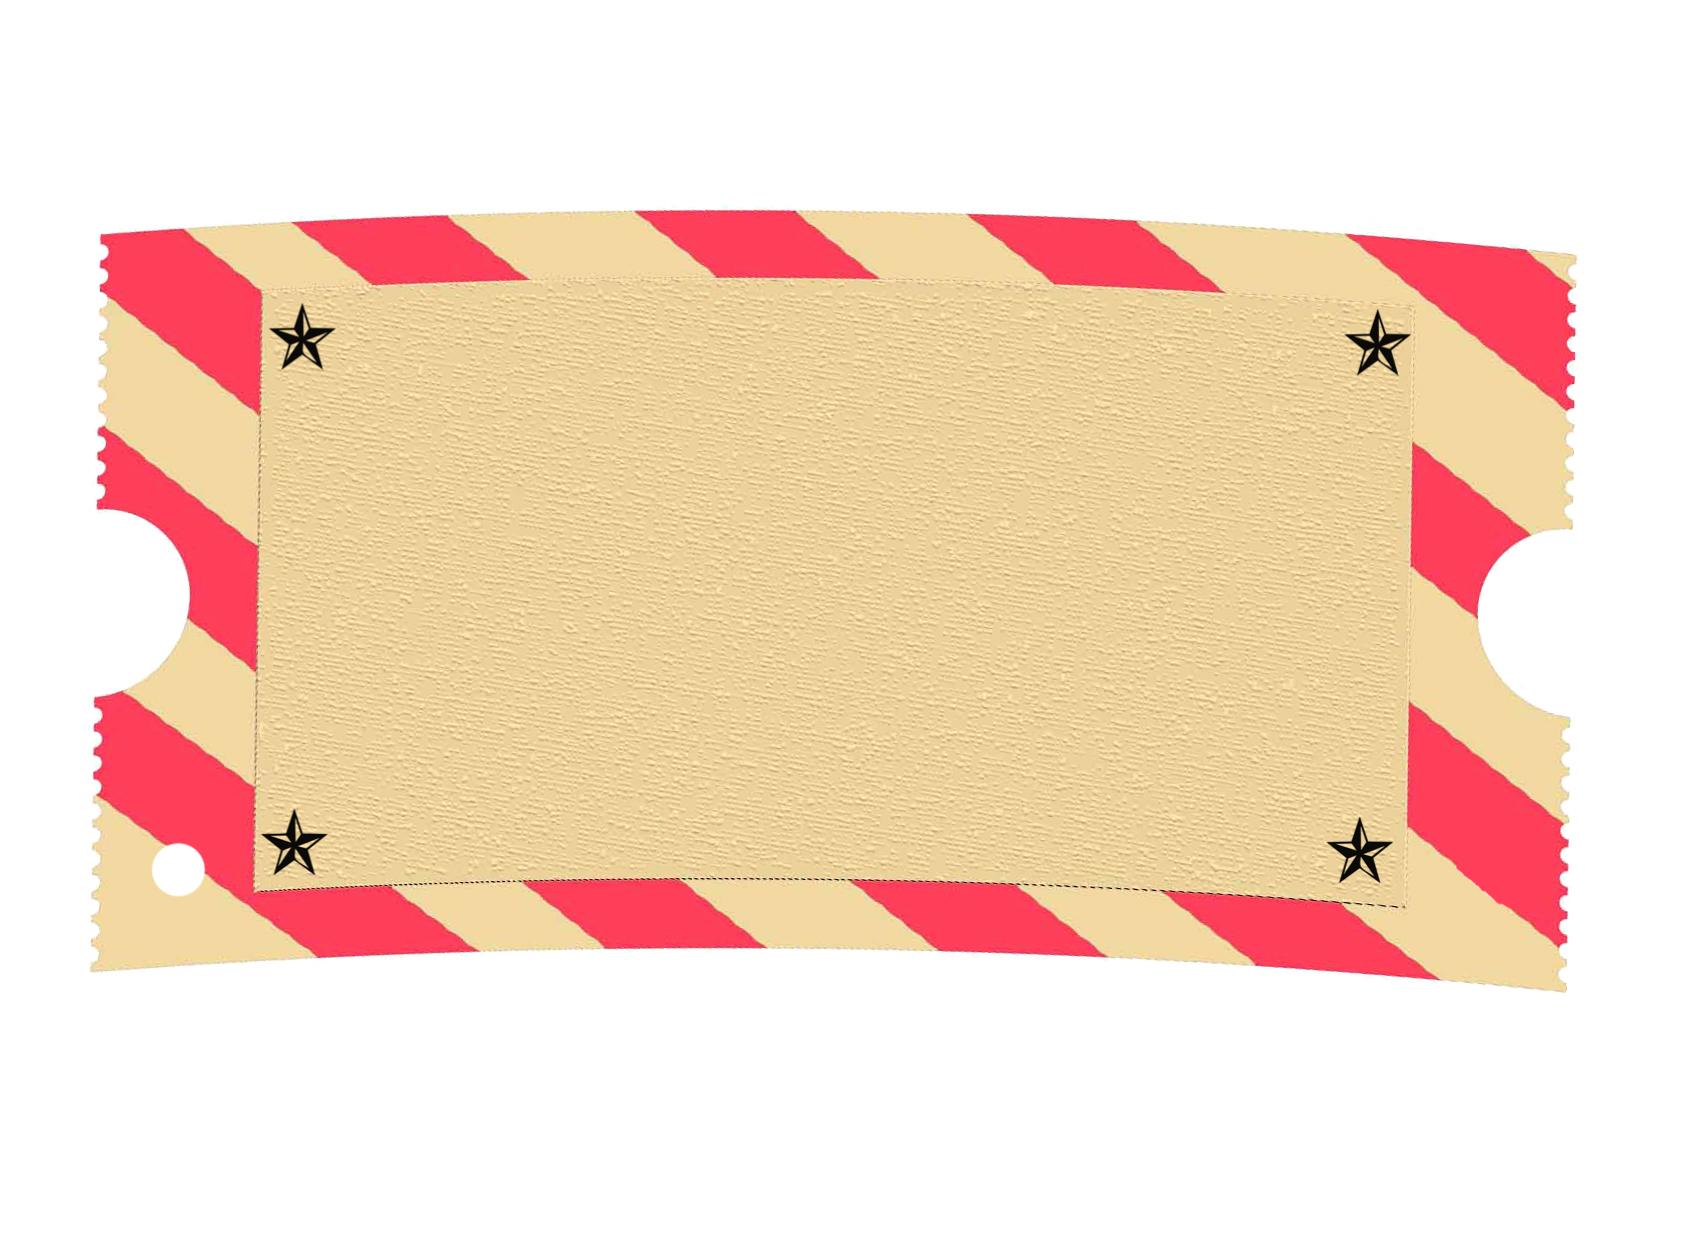 Free Ticket Borders, Download Free Clip Art, Free Clip Art ...